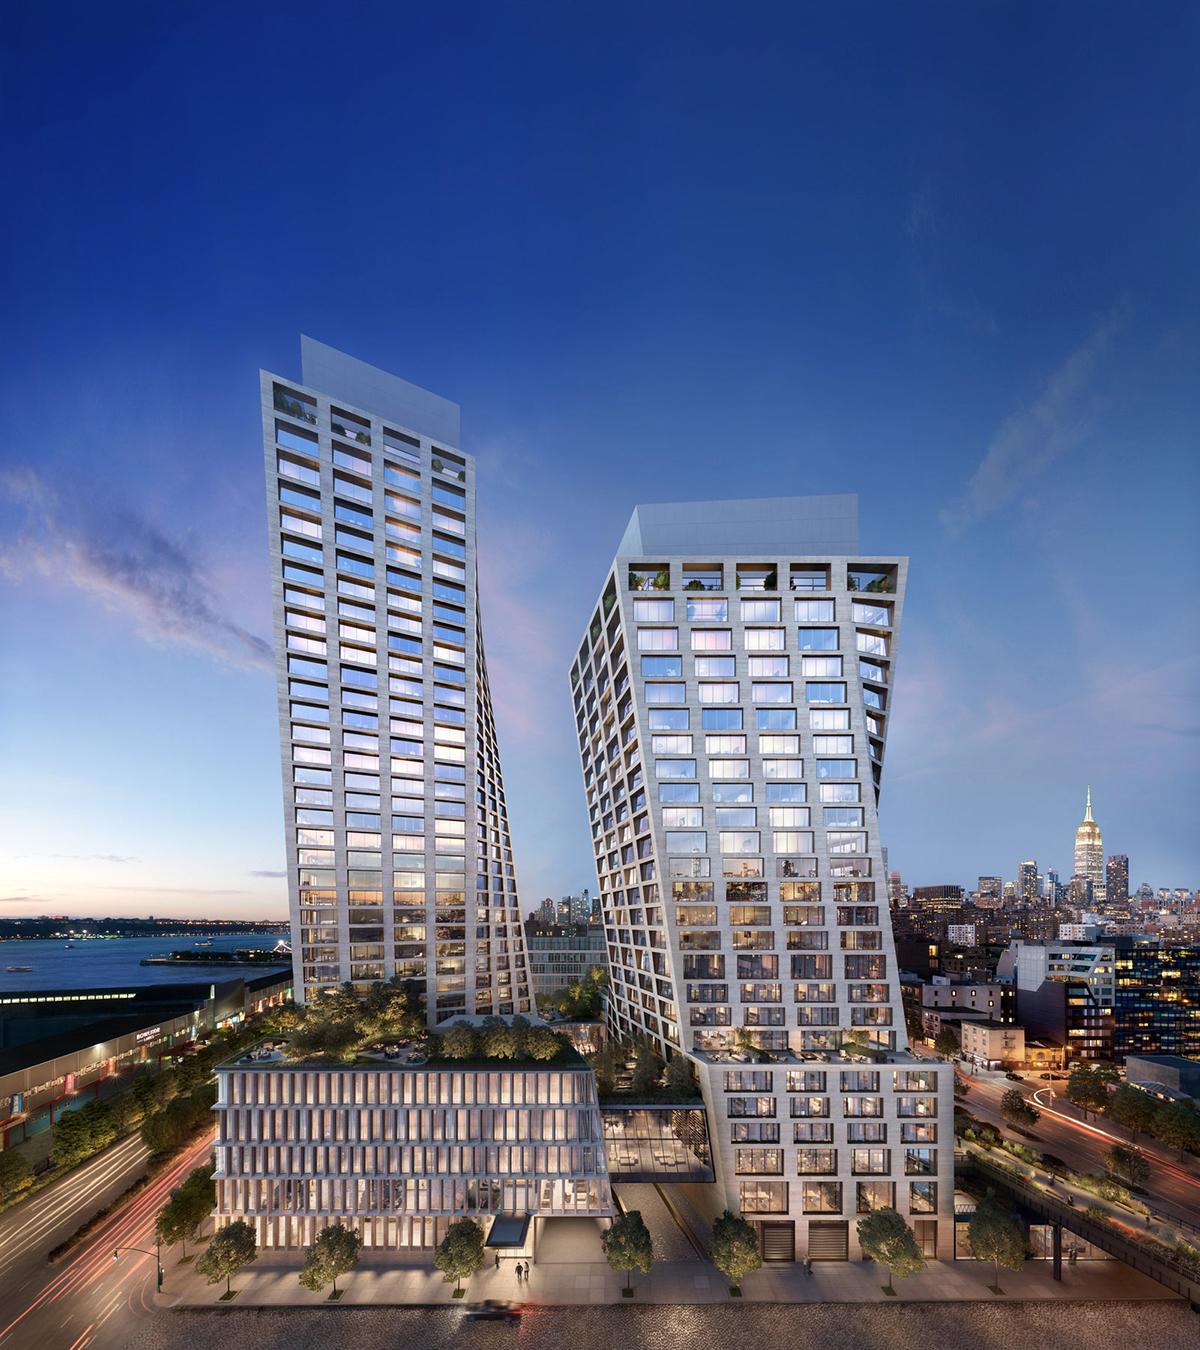 Six Senses New York hôtel design